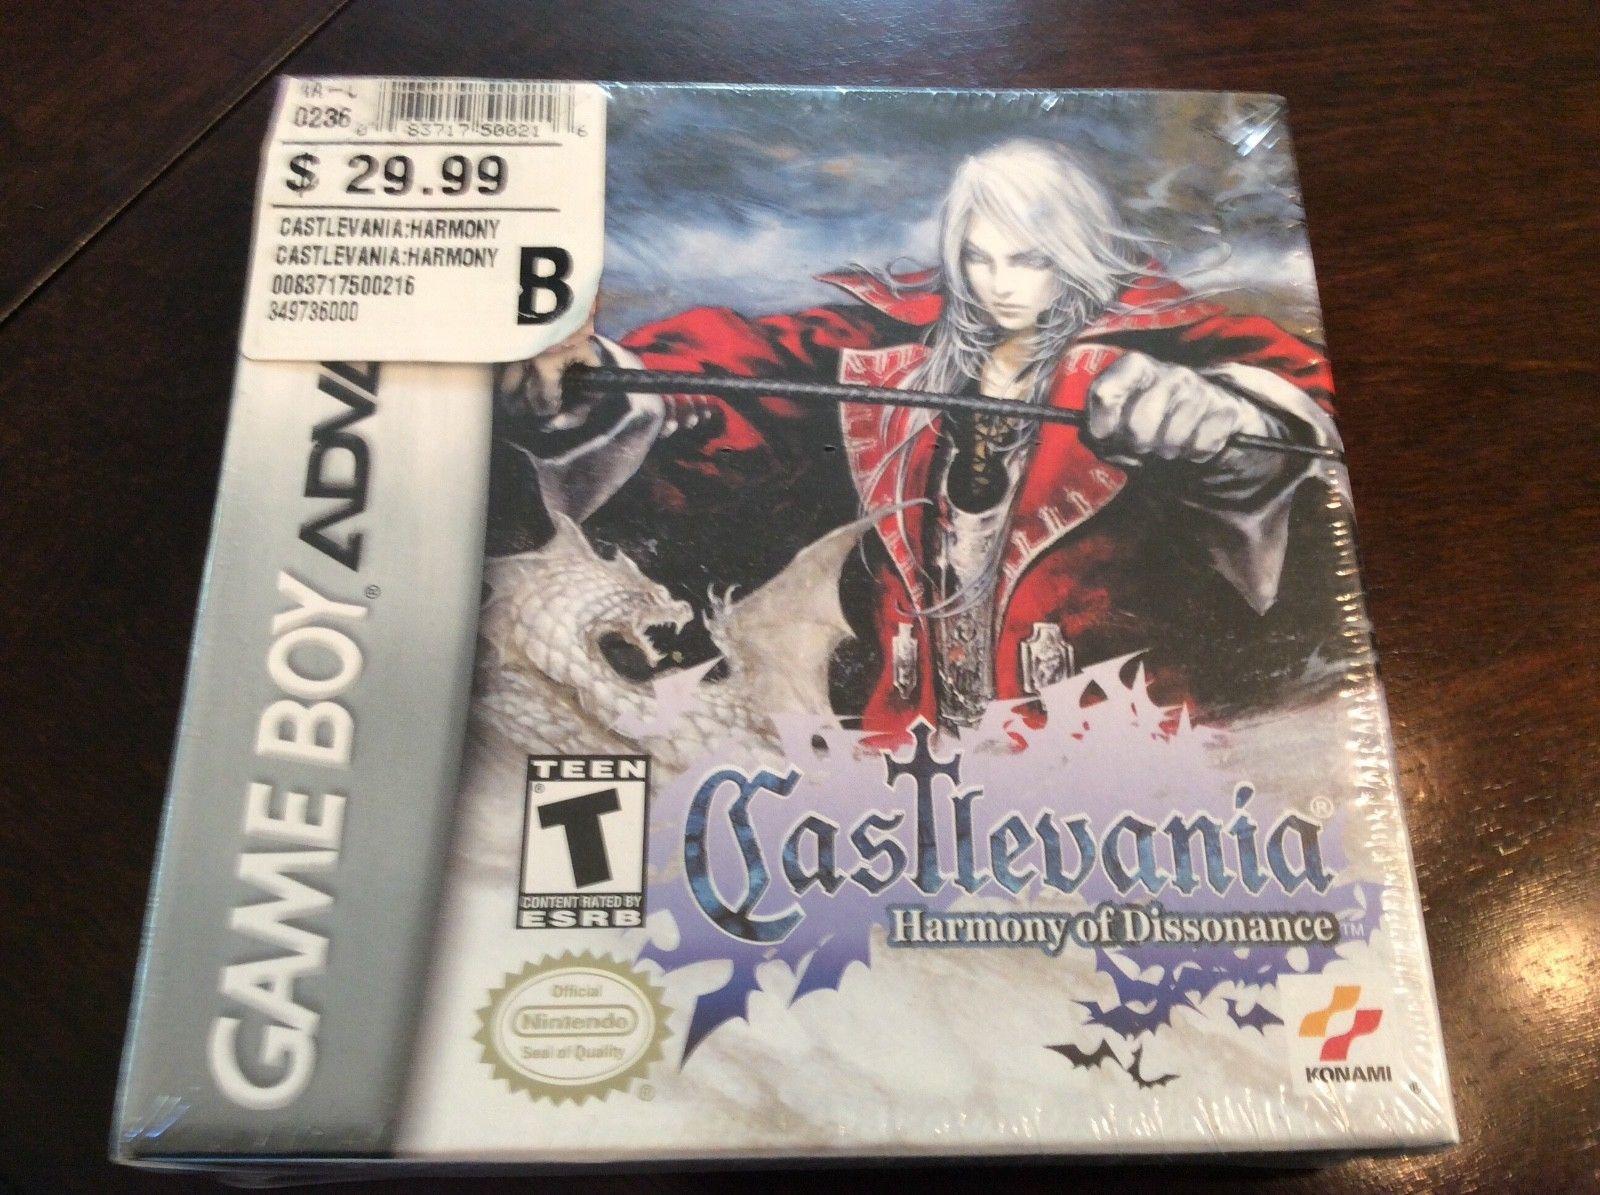 Castlevania Harmony Of Dissonance Nintendo Game Boy Advance GBA NEW Sealed 21995 End